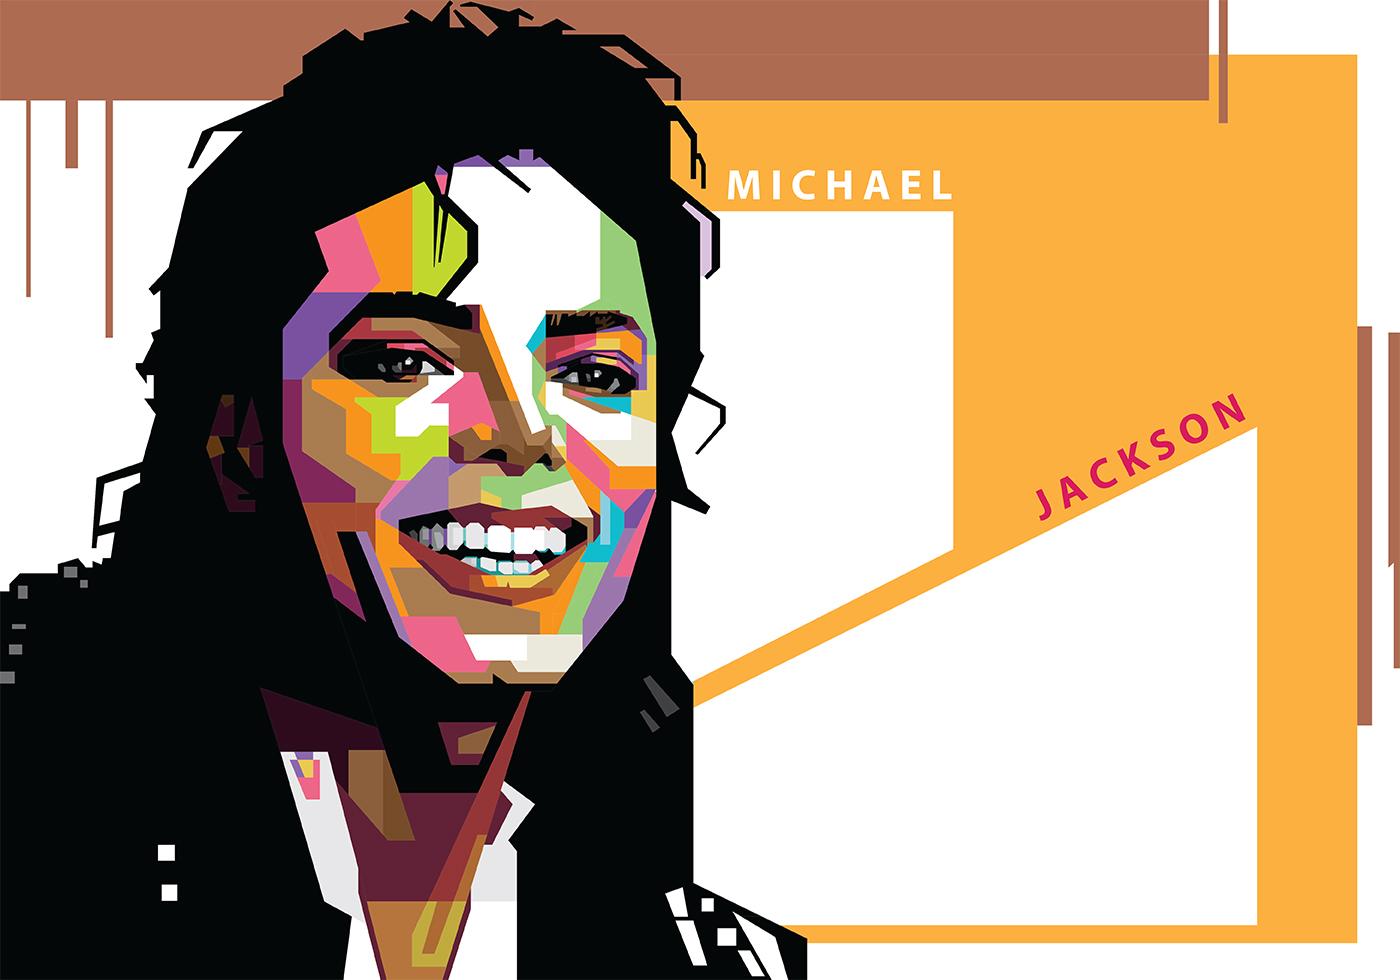 Michael Jackson in Popart Portrait